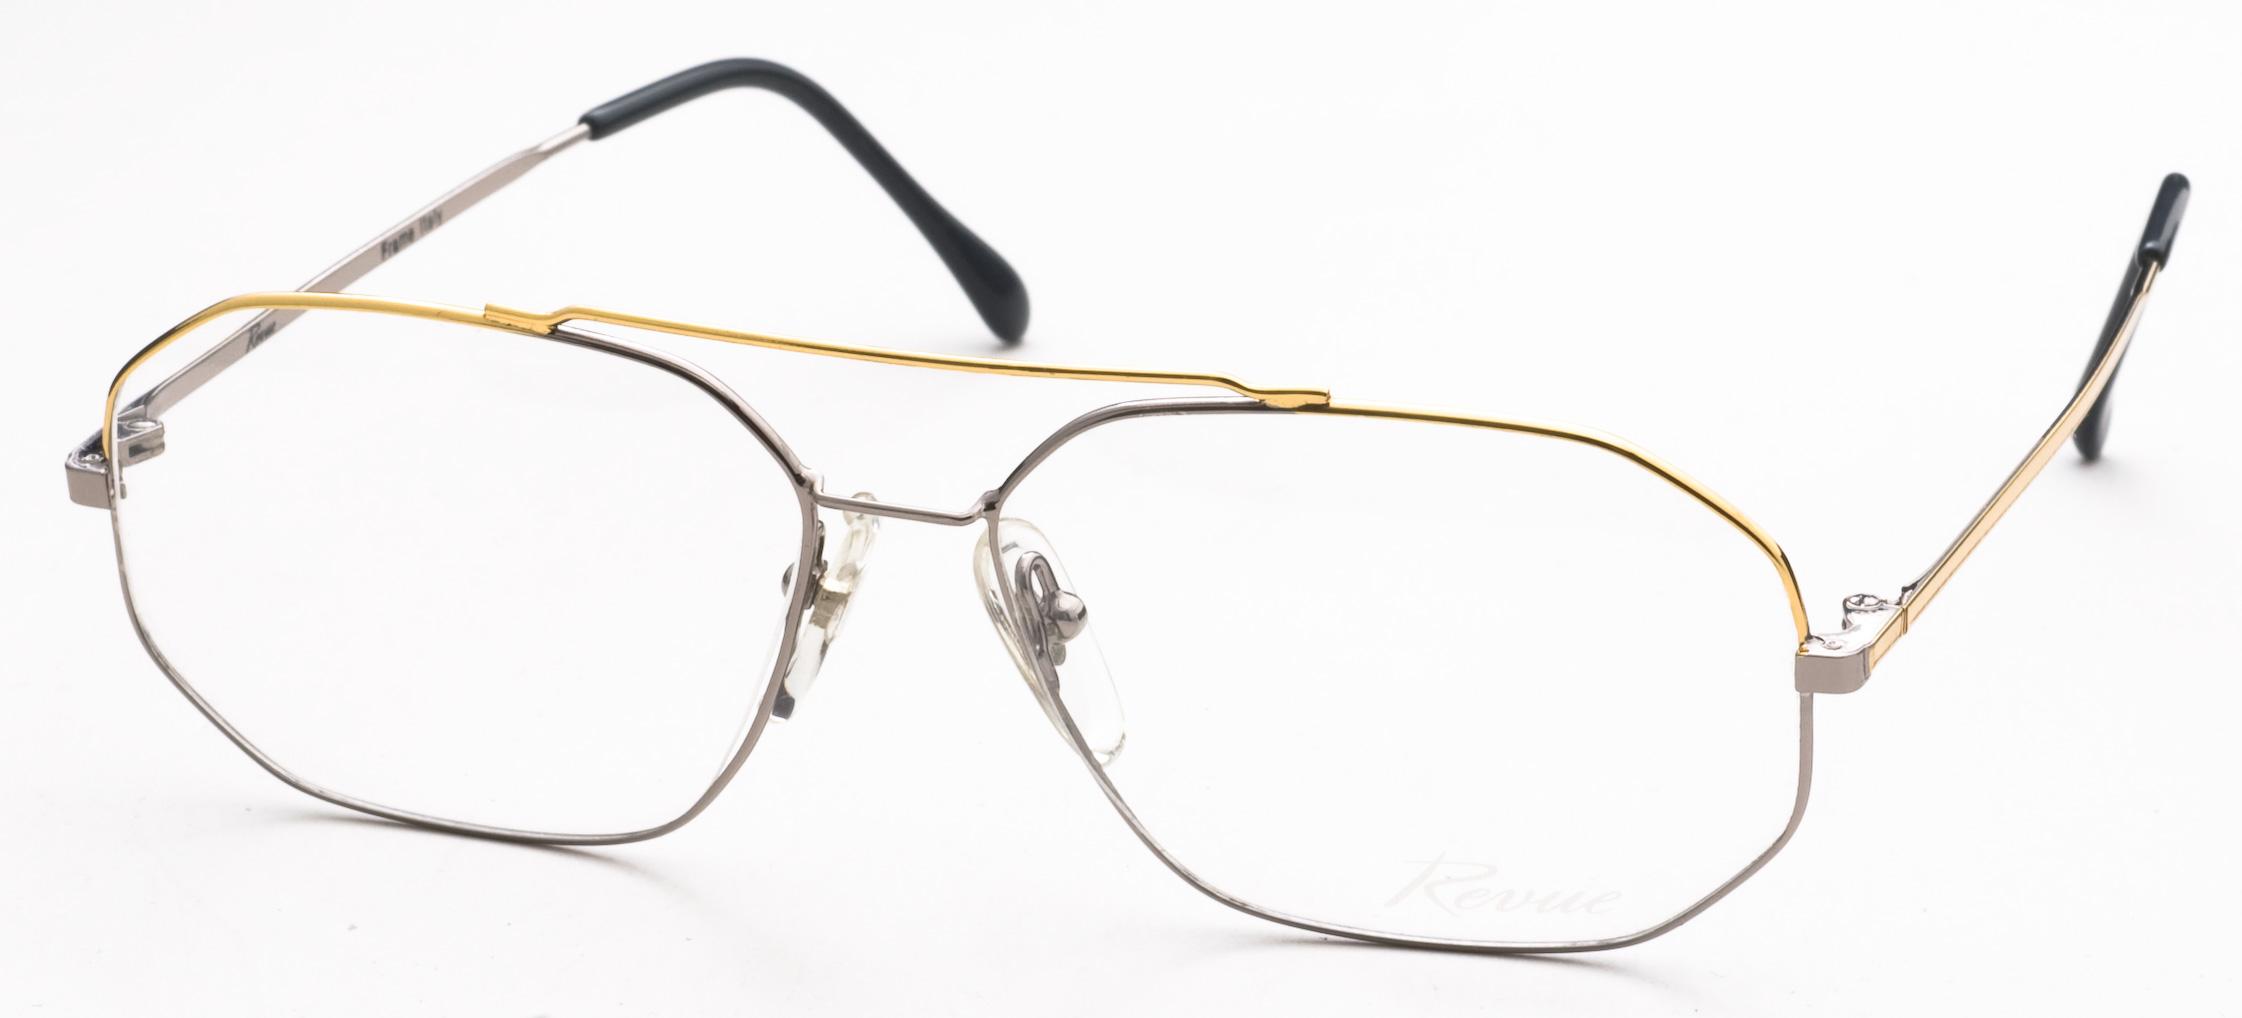 Image of 111 Eyeglasses, Pewter/Gold